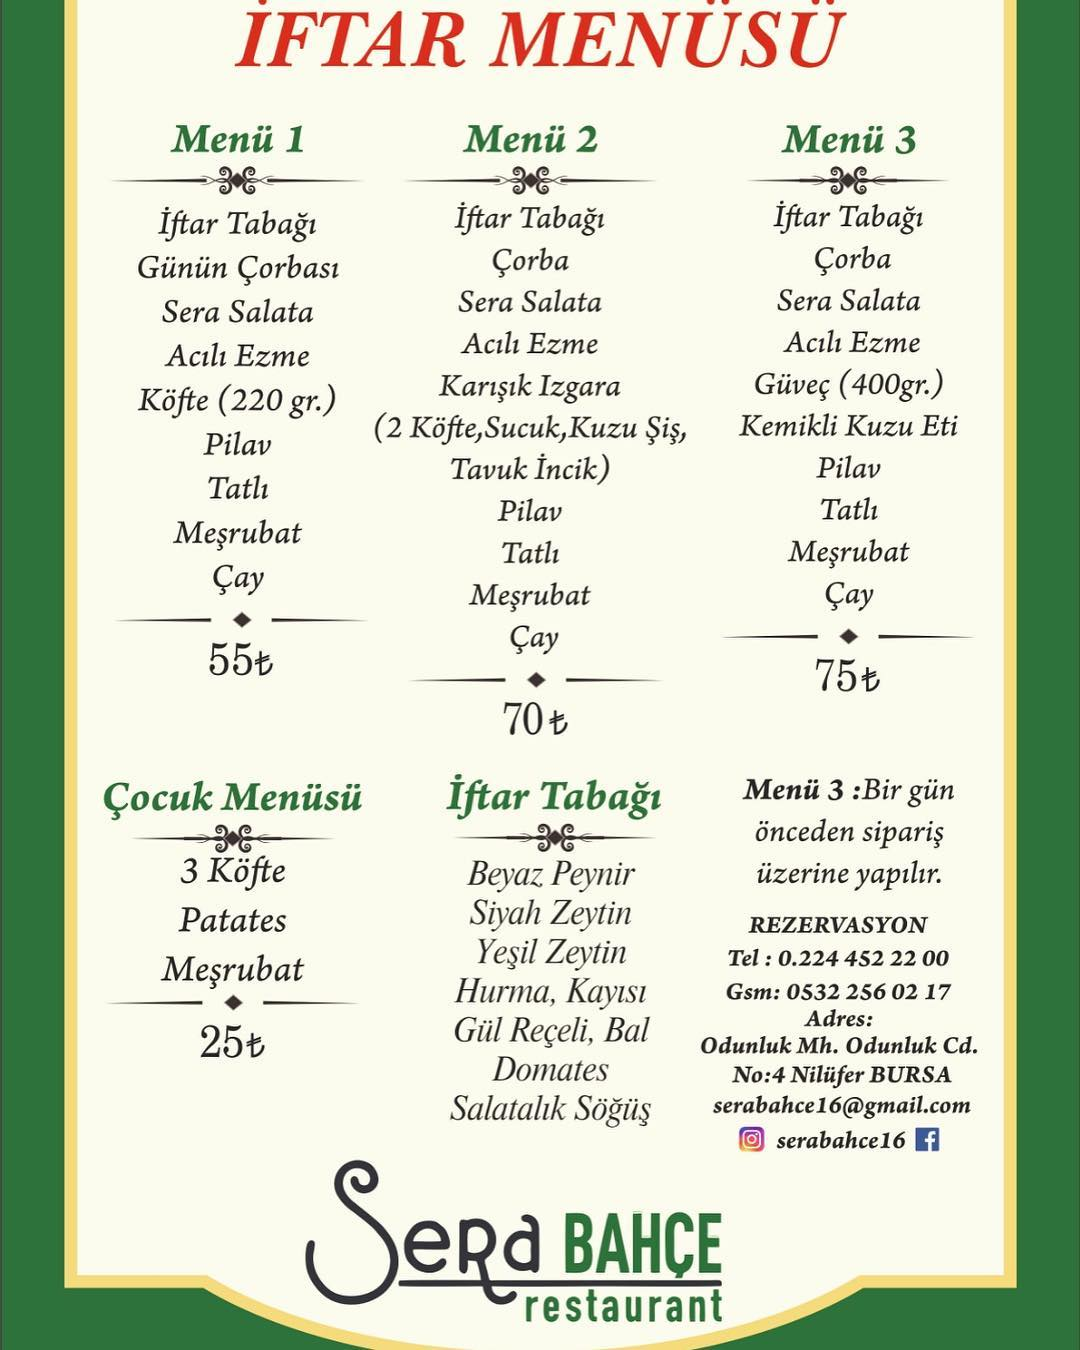 bursa iftar mekanları 2019 bursa iftar menüleri 2019 bursa iftar menüsü 2019